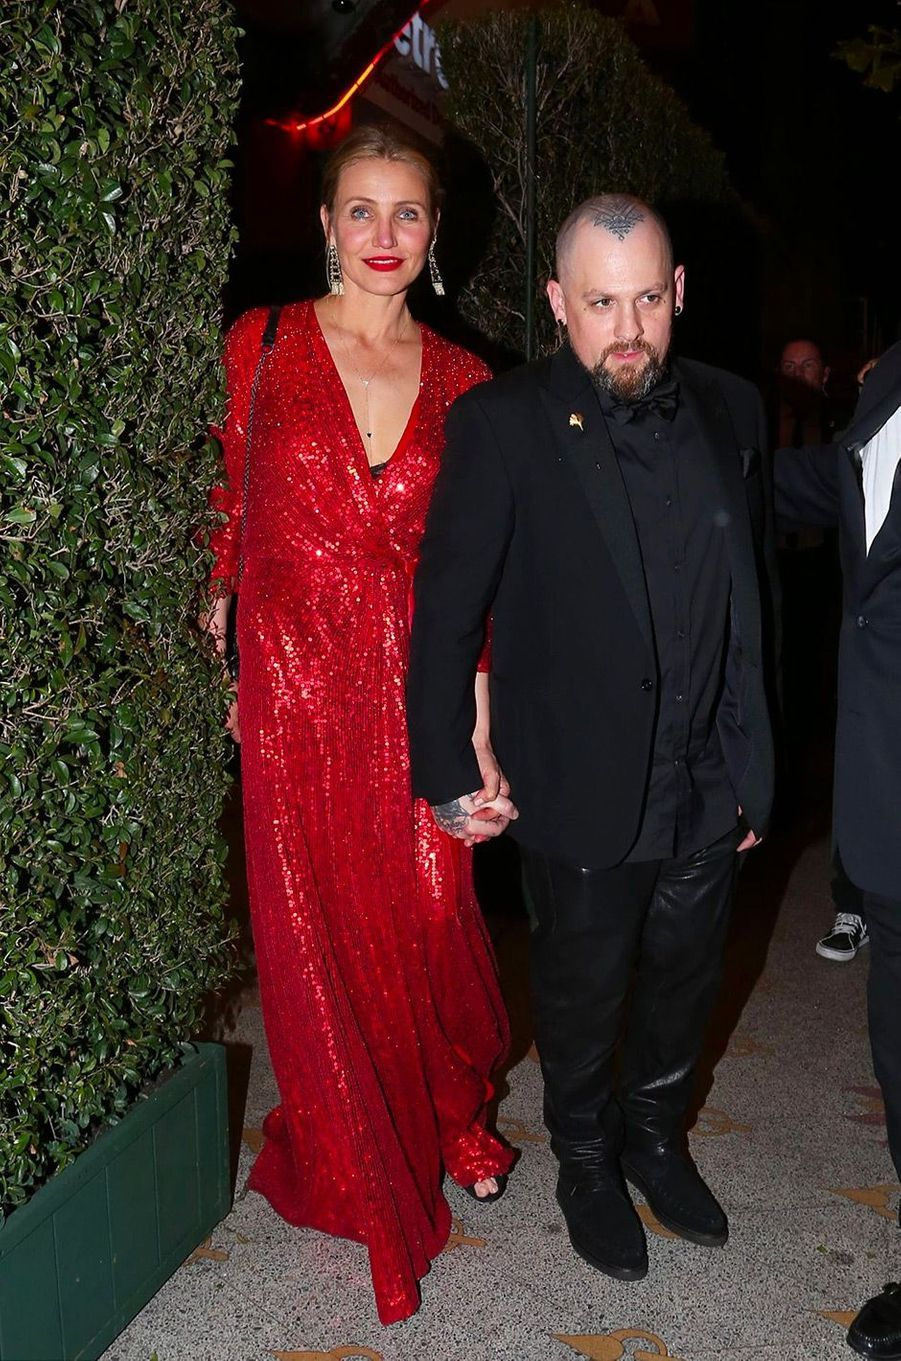 Cameron Diazet Benji Maddenà la fête de fiançailles de Gwyneth Paltrow